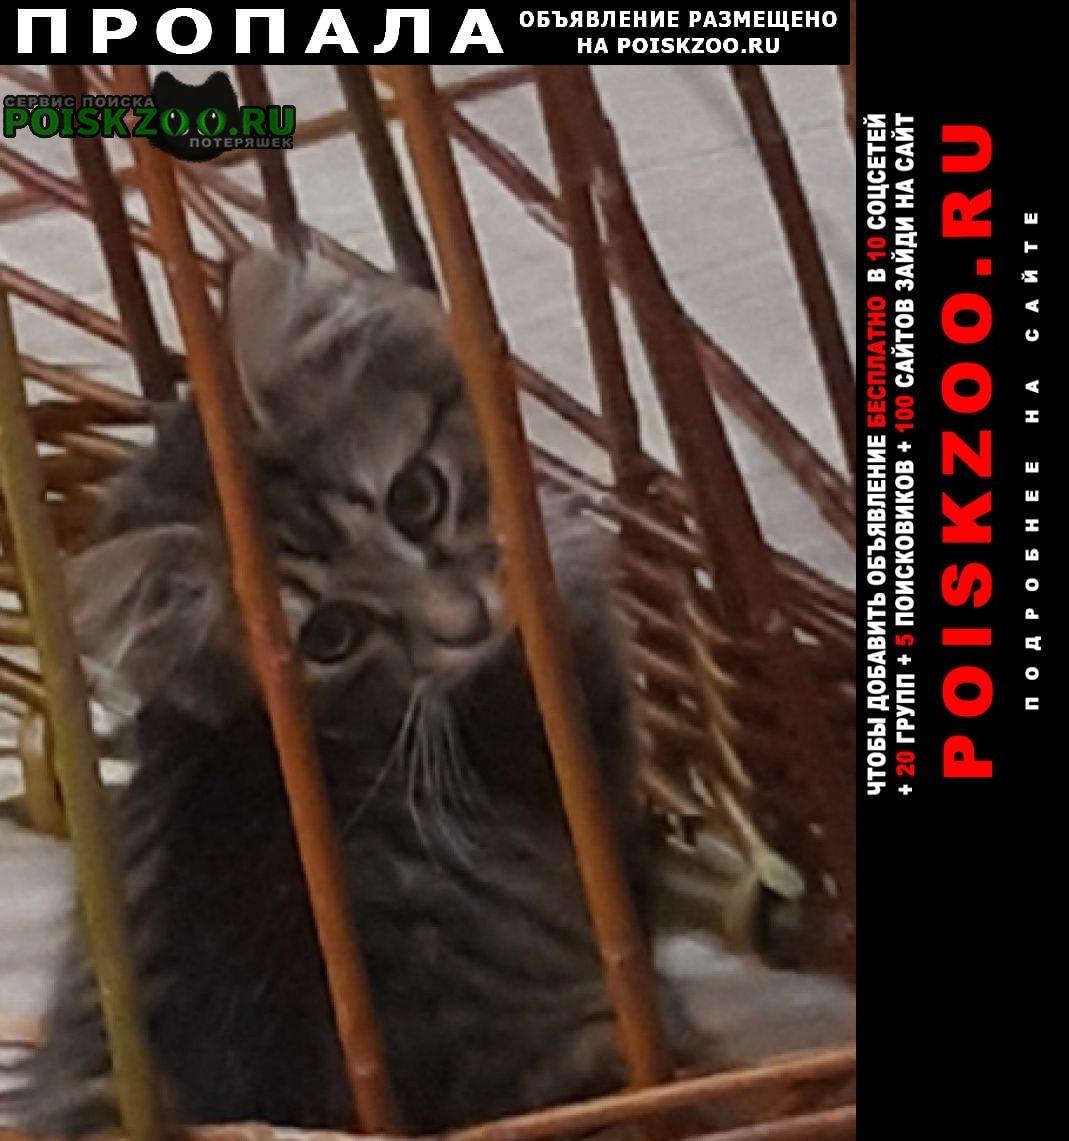 Пропала кошка помогите найти Бор